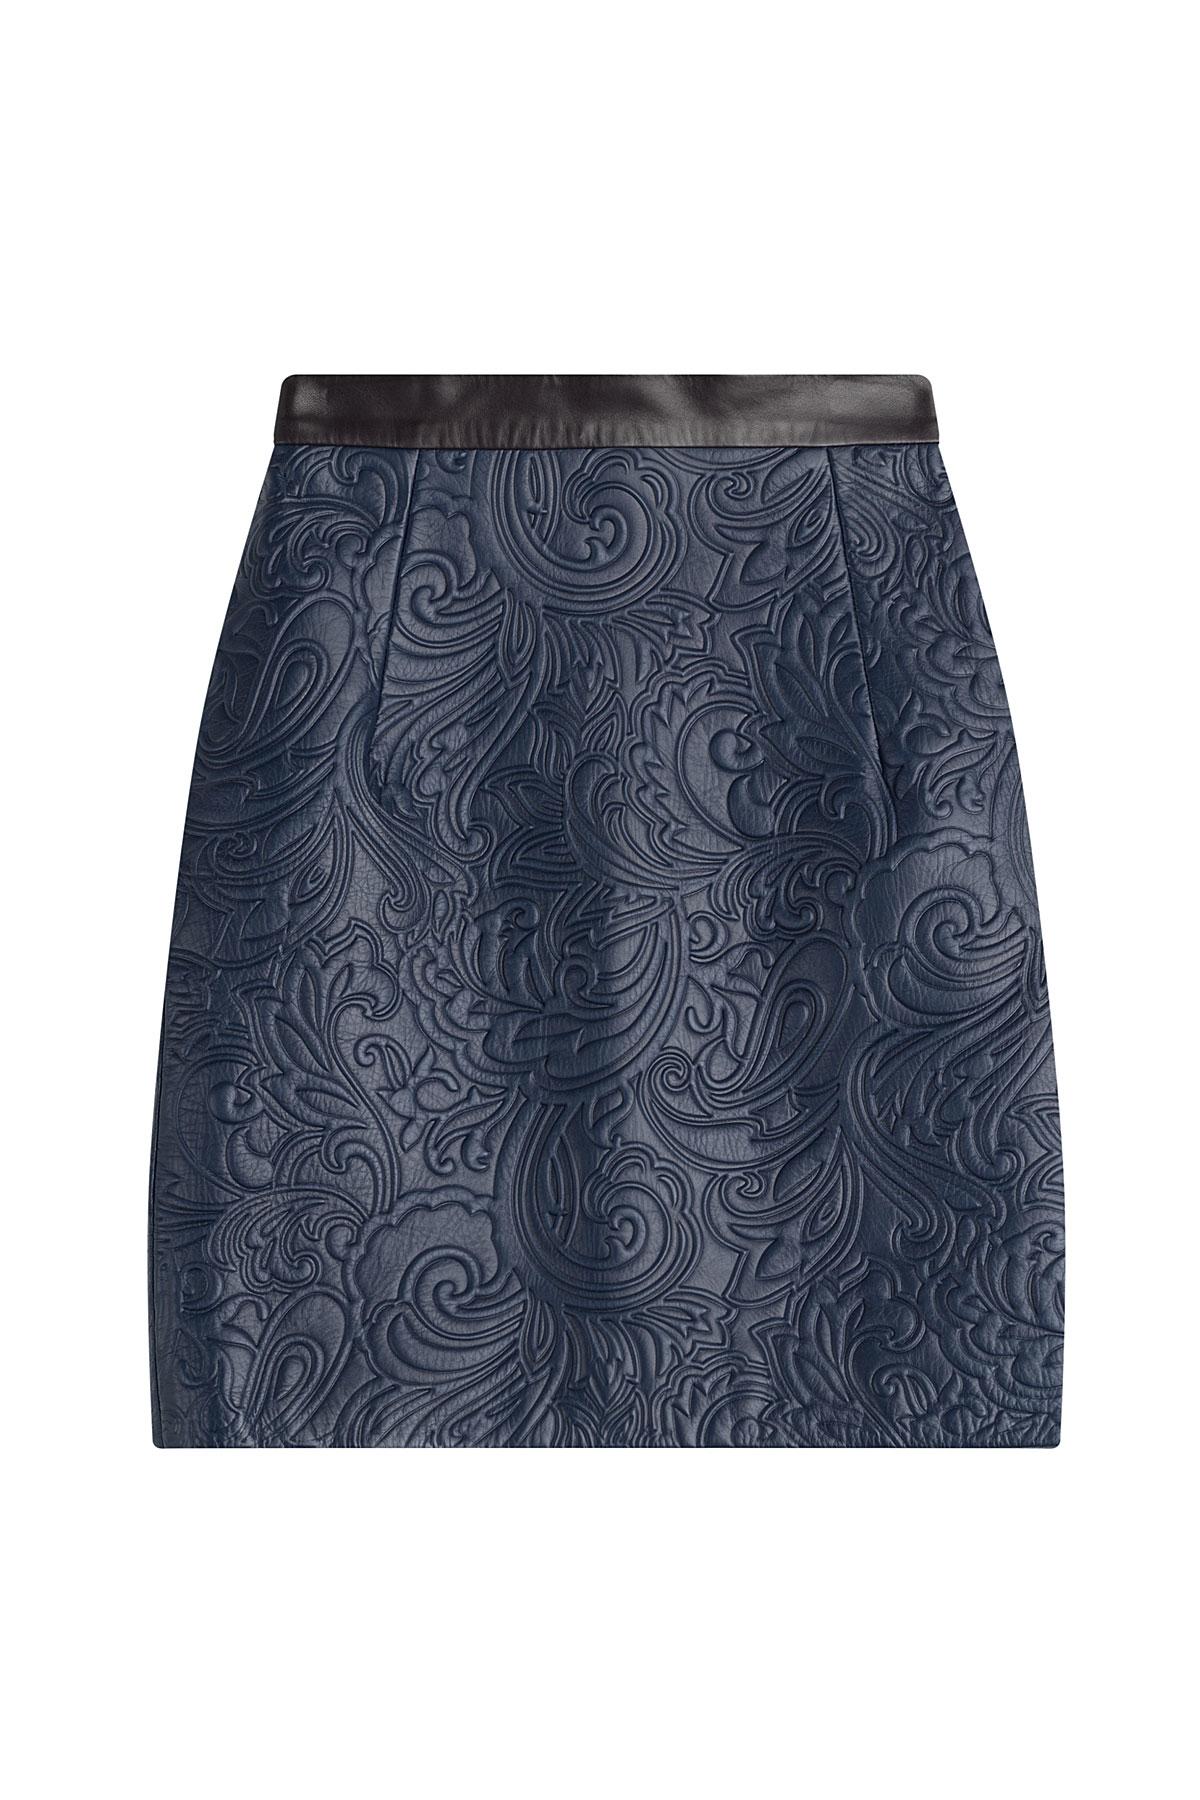 katrantzou embossed leather mini skirt blue in blue